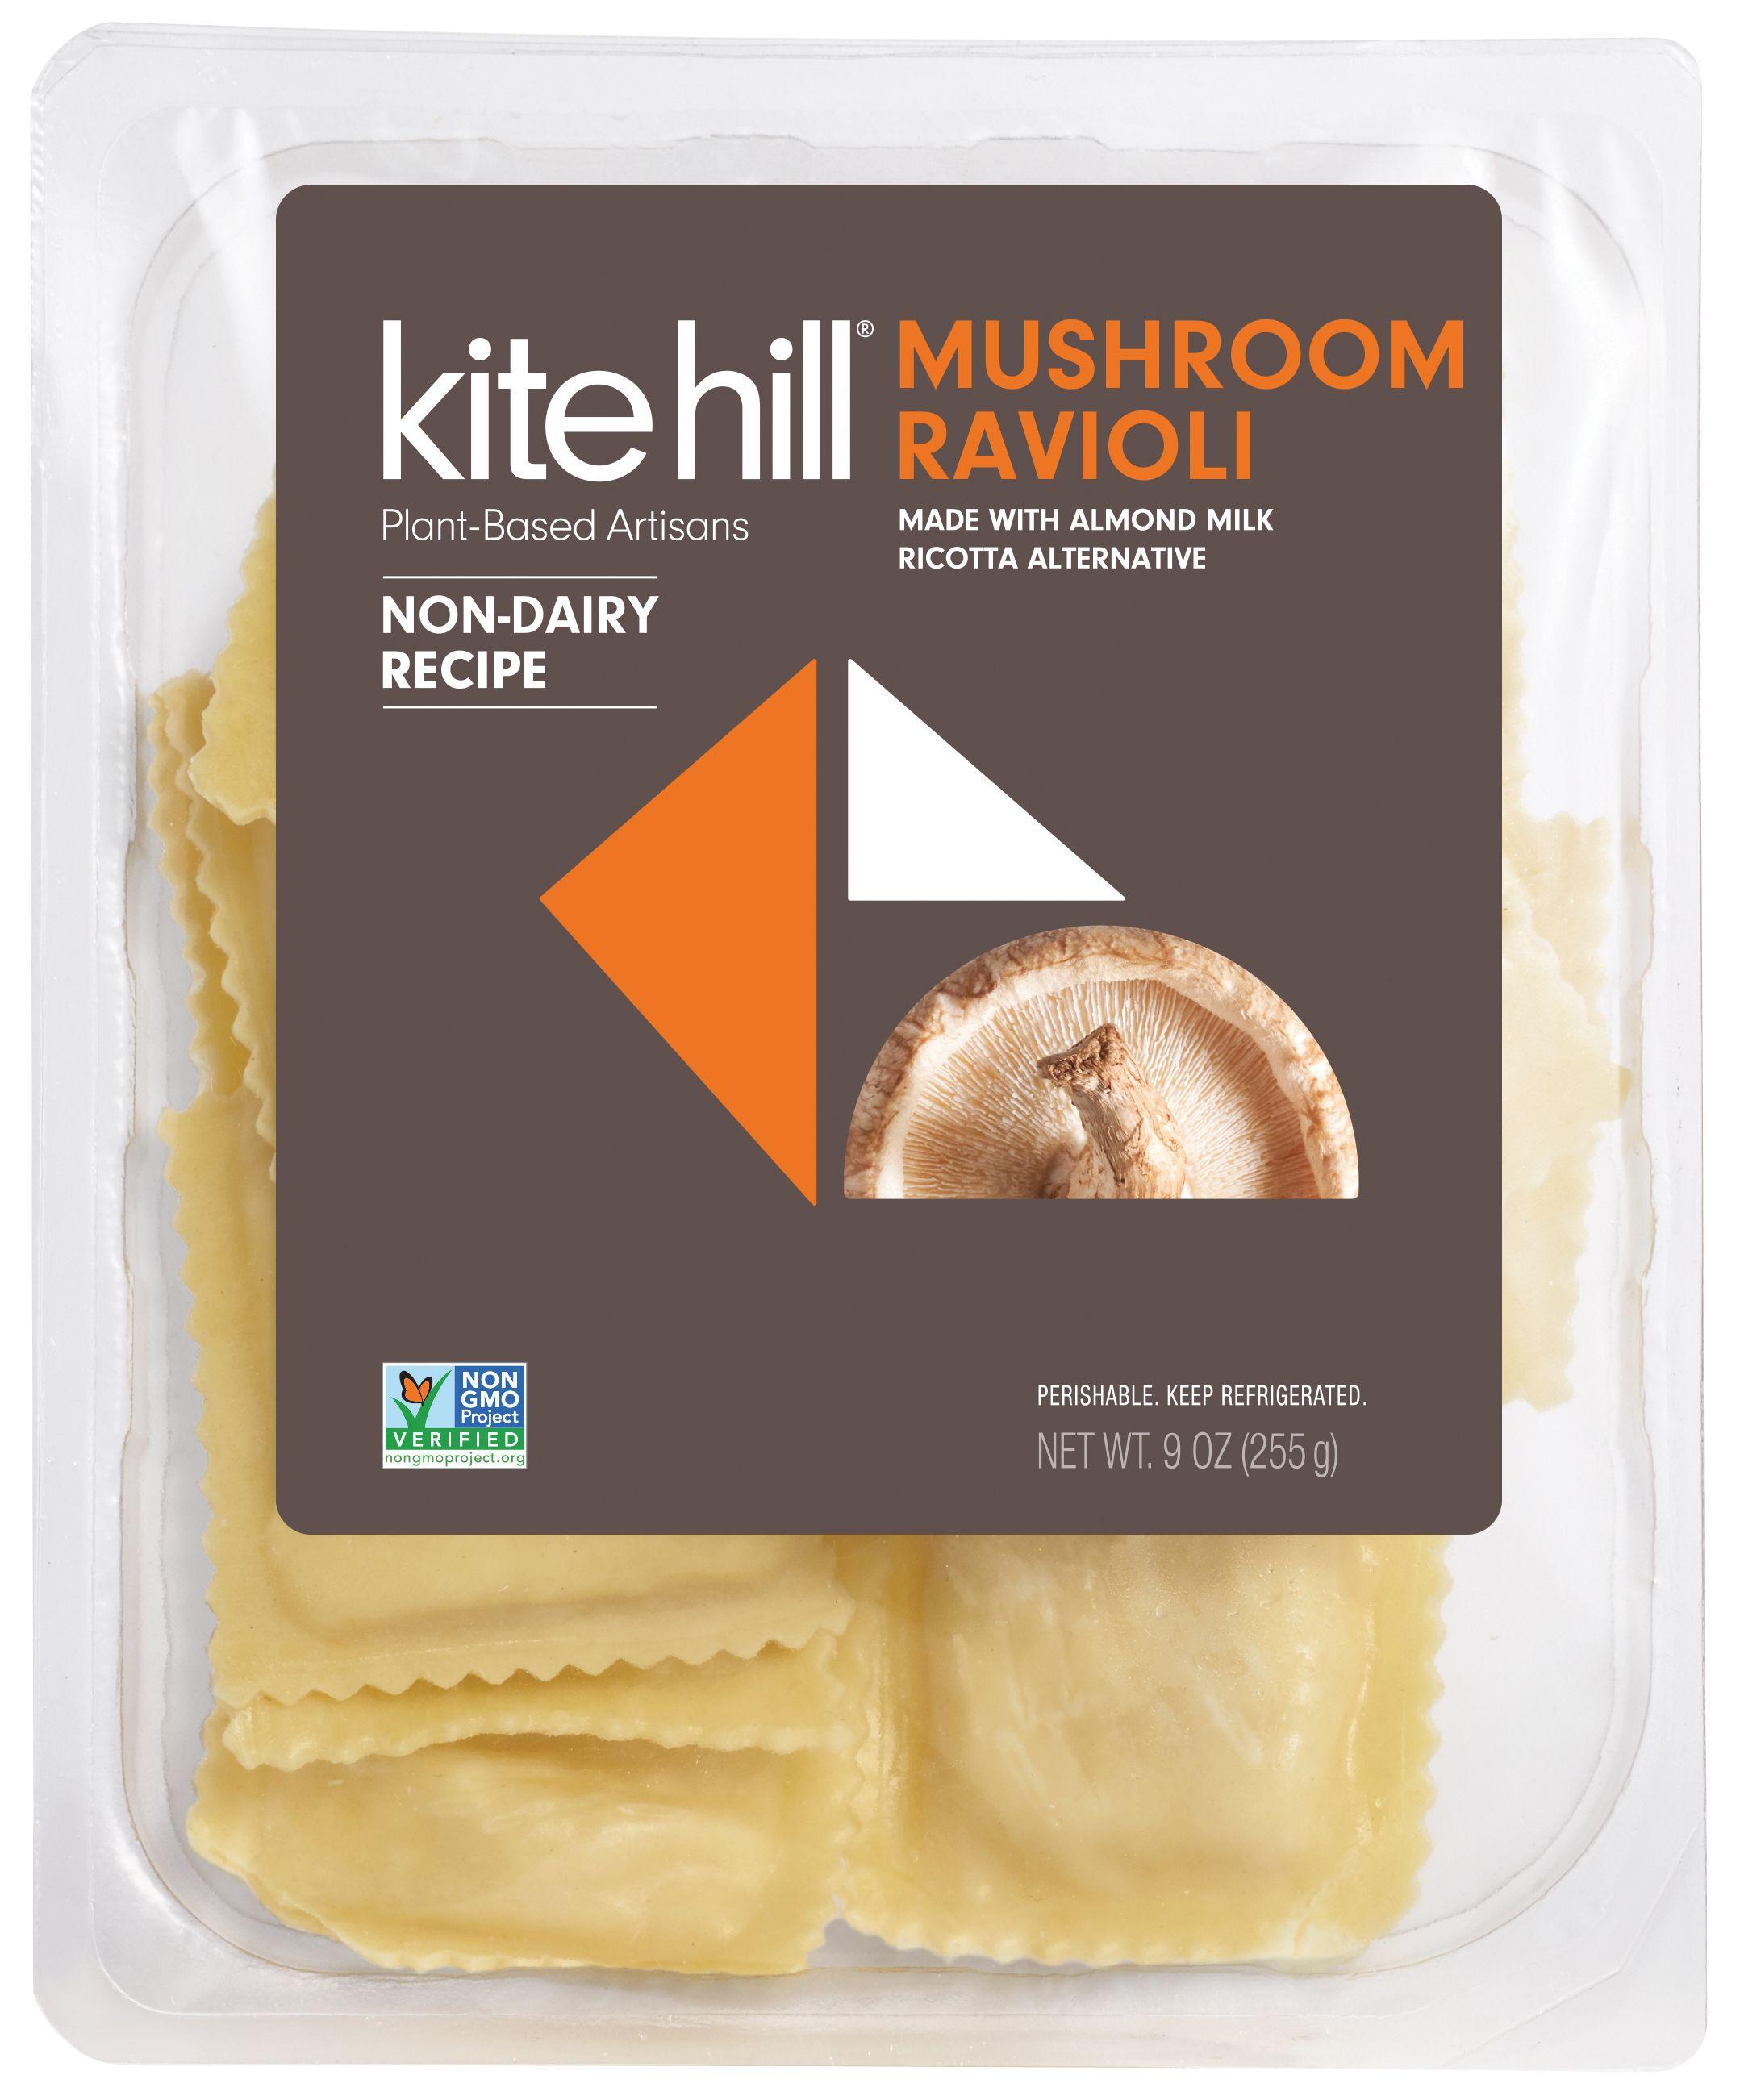 Kite Hill Filled Pastas In 2020 Ricotta Alternative No Dairy Recipes Stuffed Mushrooms